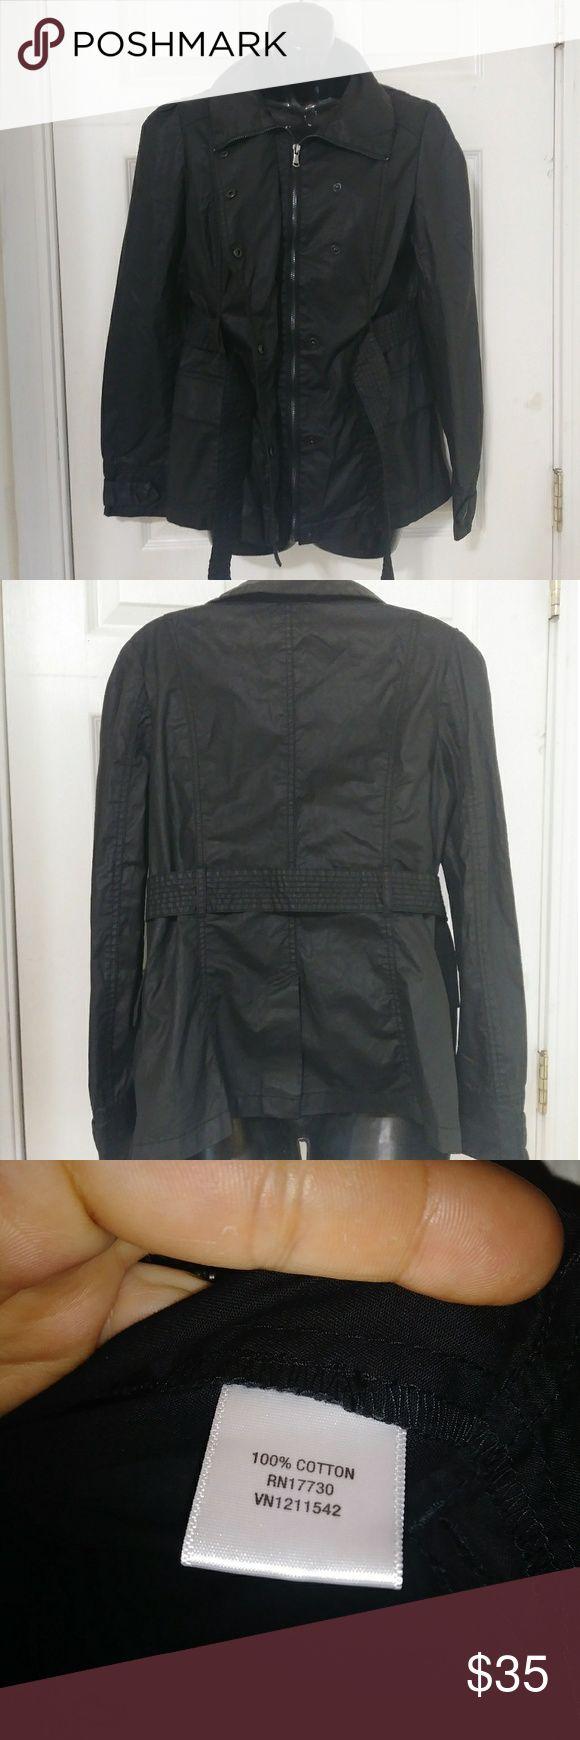 Converse Women's Rain Jacket Black size med.Zipper and buttons.Tie at waist. Converse Jackets & Coats